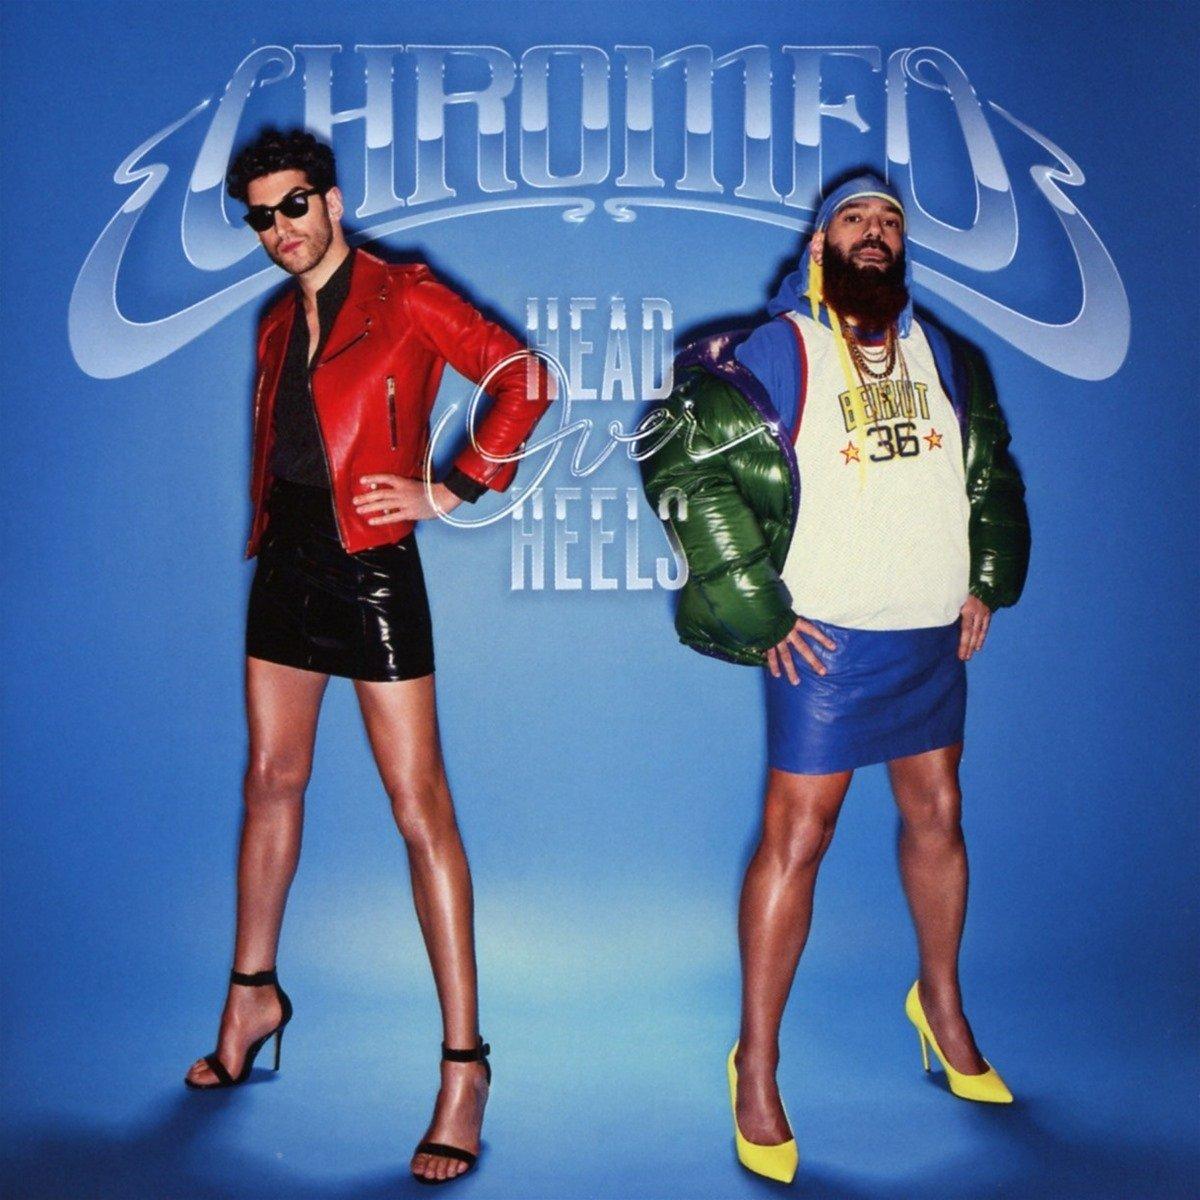 Chromeo head over heels album art cover artwork